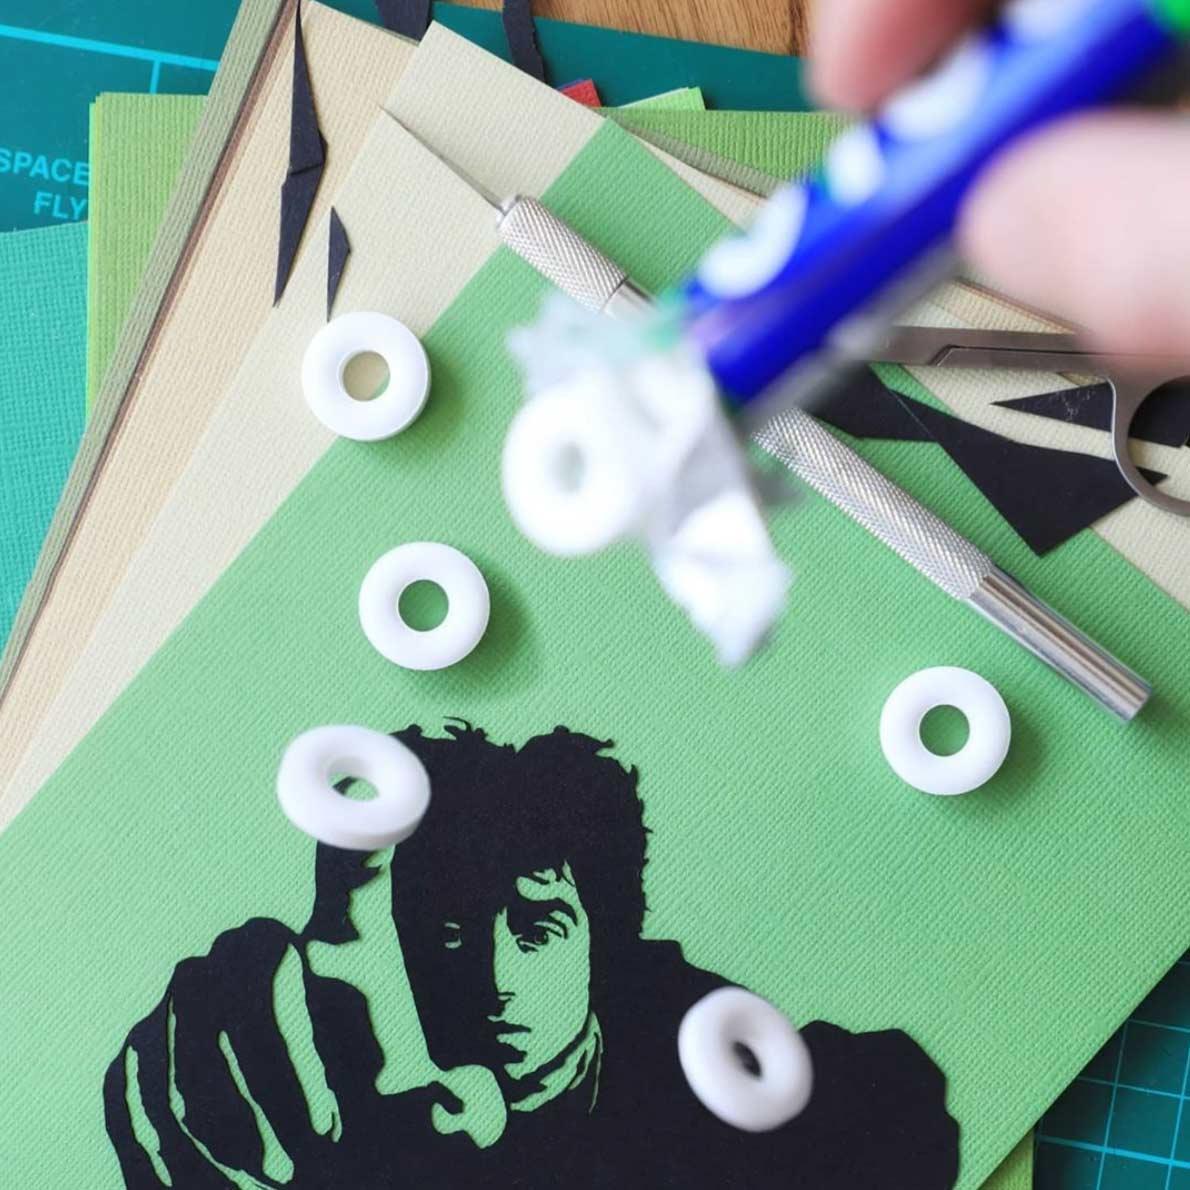 Filmszenen mit Papierschnitt von paperboyo paperboyo_filmszenen_05